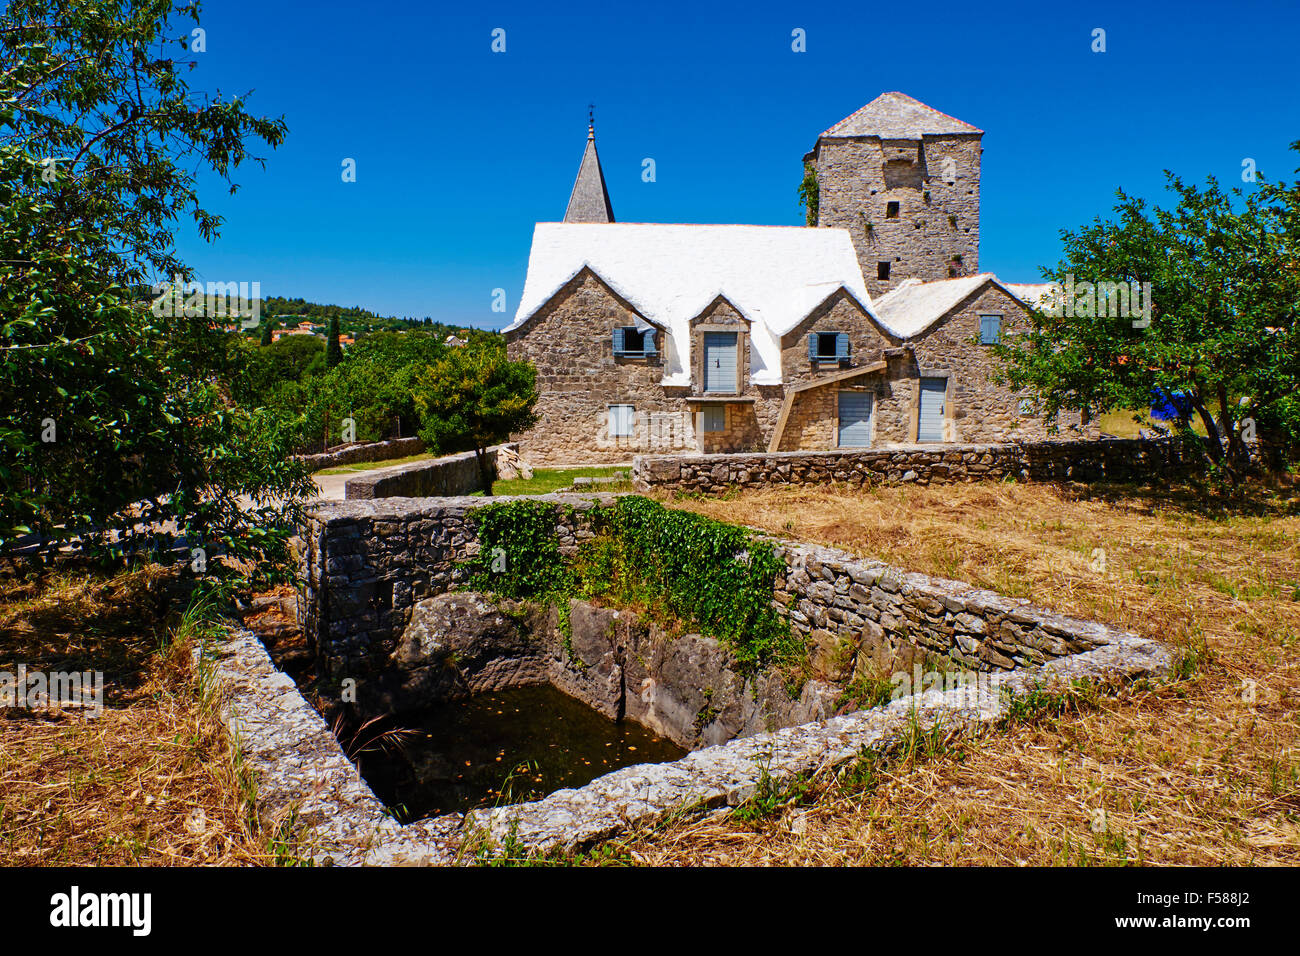 Croacia, Dalmacia Isla Brac, Skrip, antigua aldea Imagen De Stock